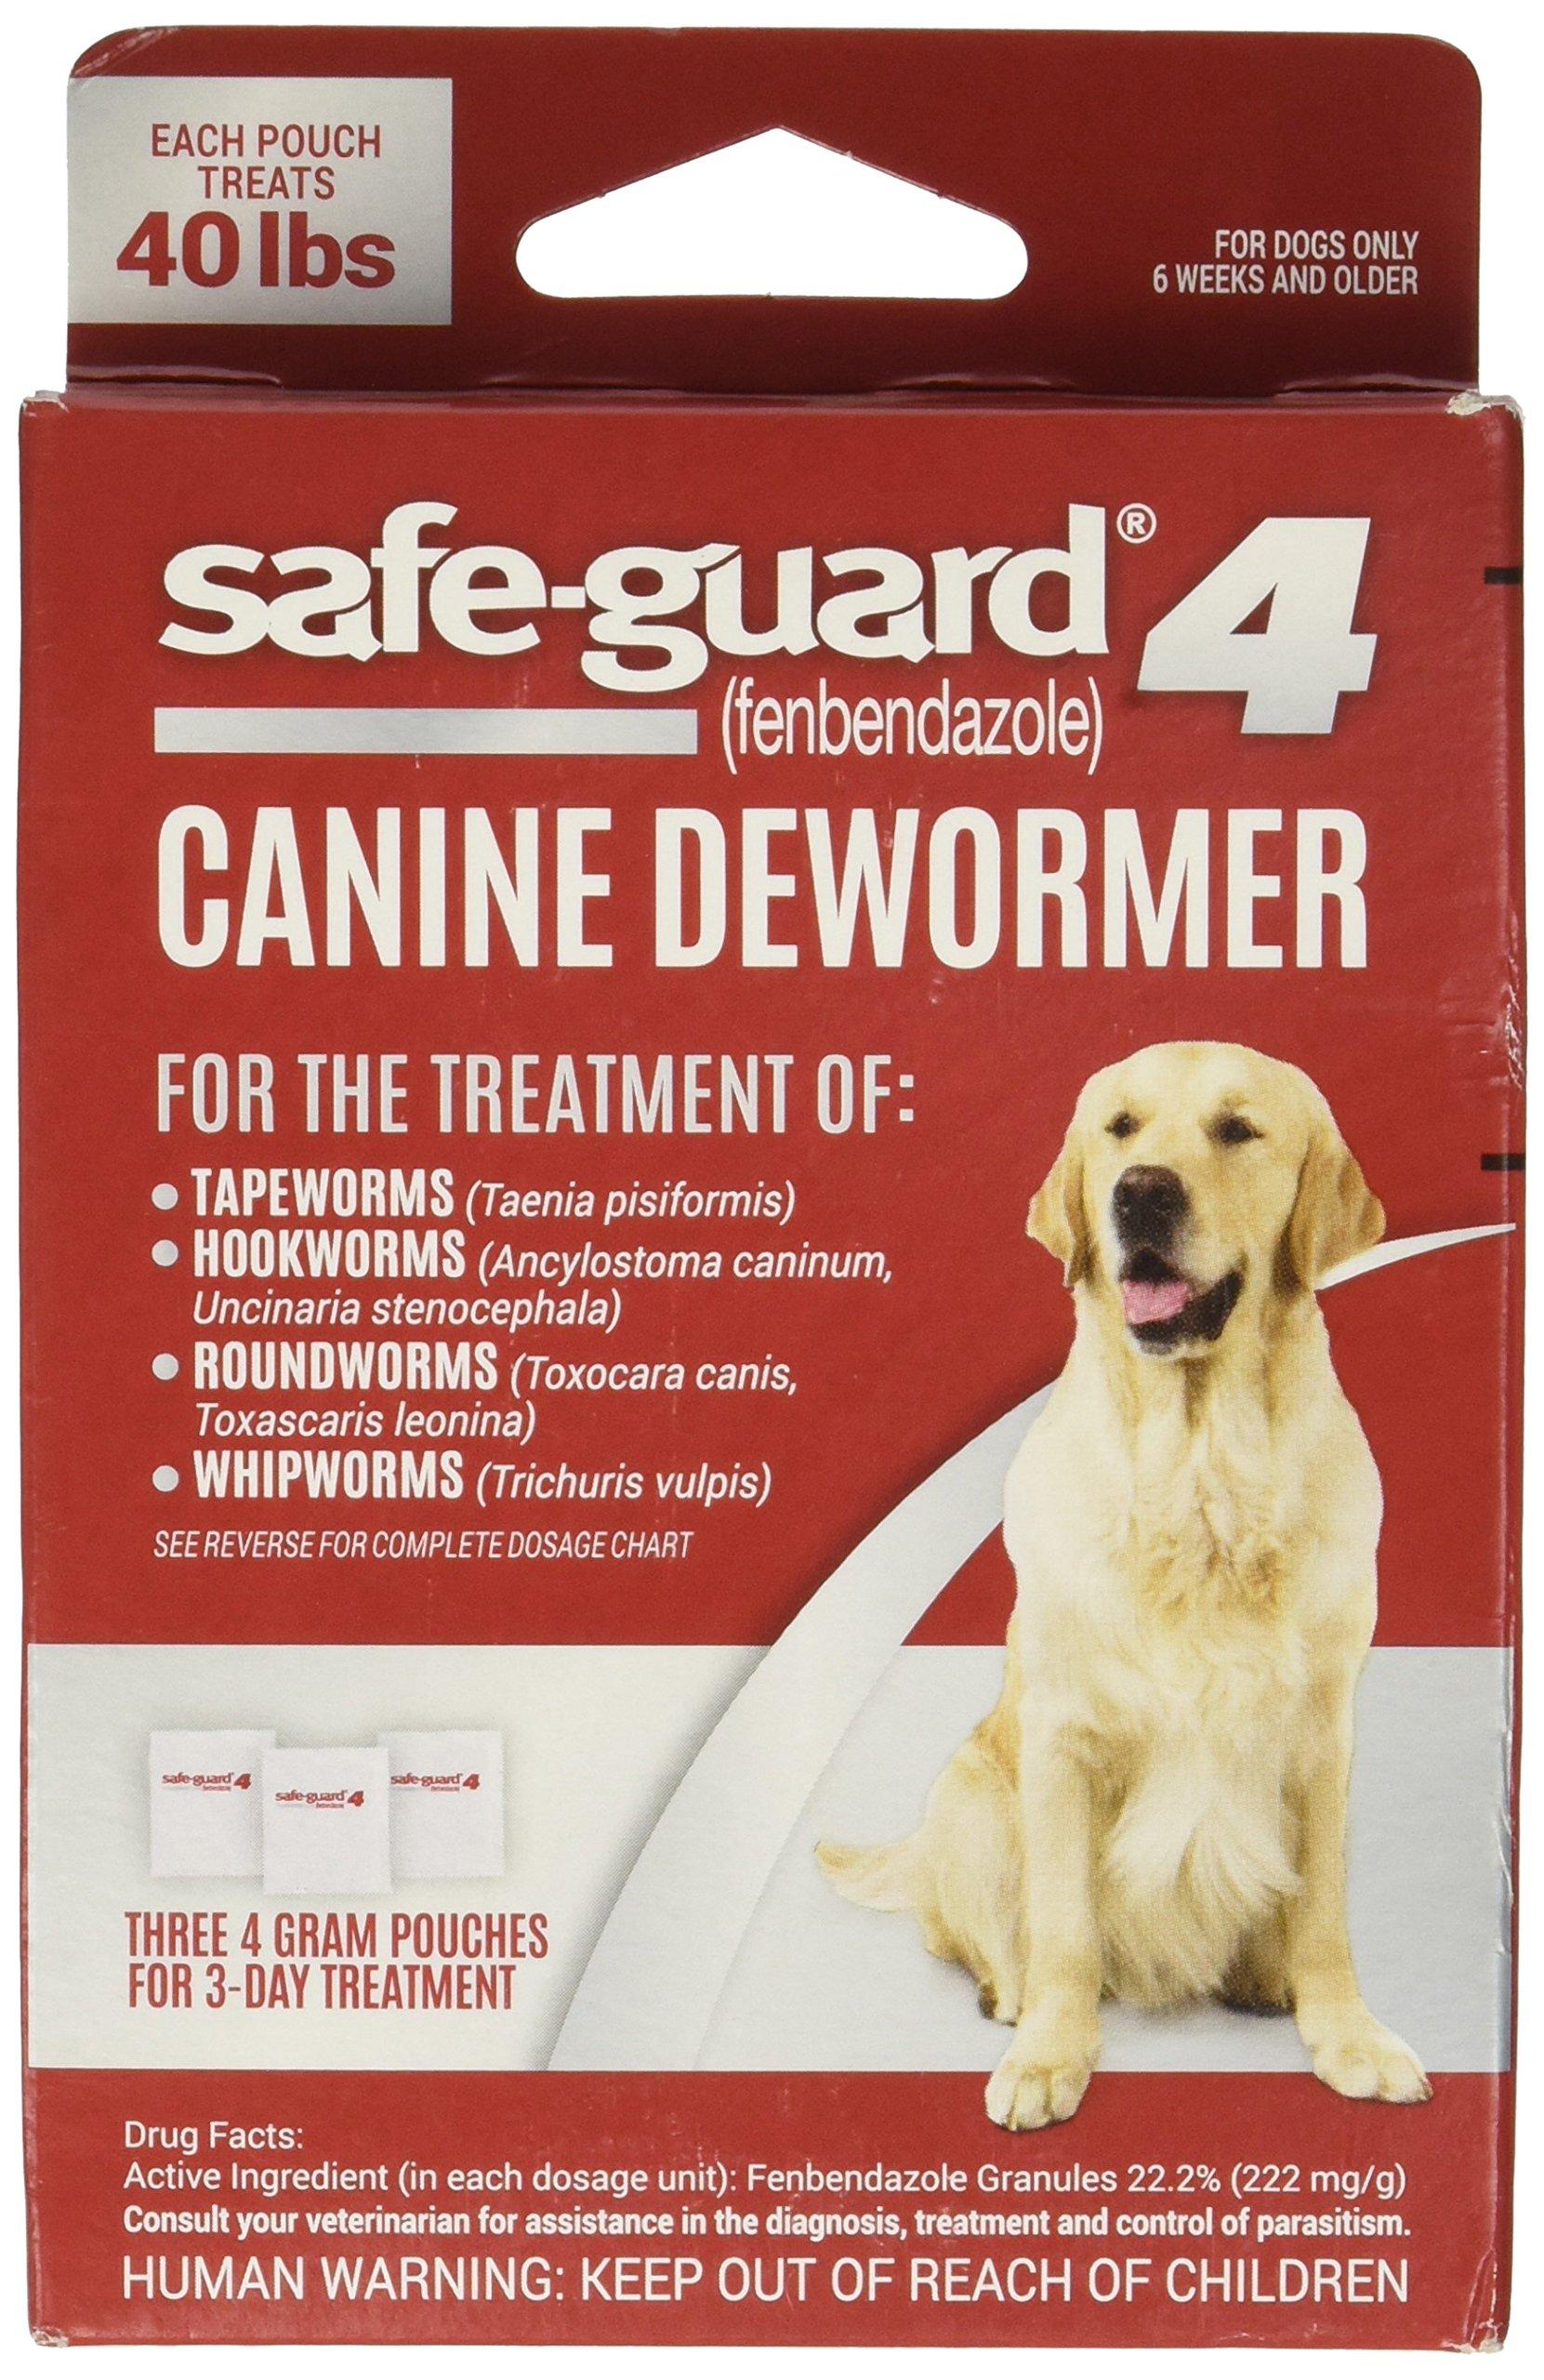 UPG - COMPANION ANIMAL Eio Wormer Safeguard 4 Lg Dog